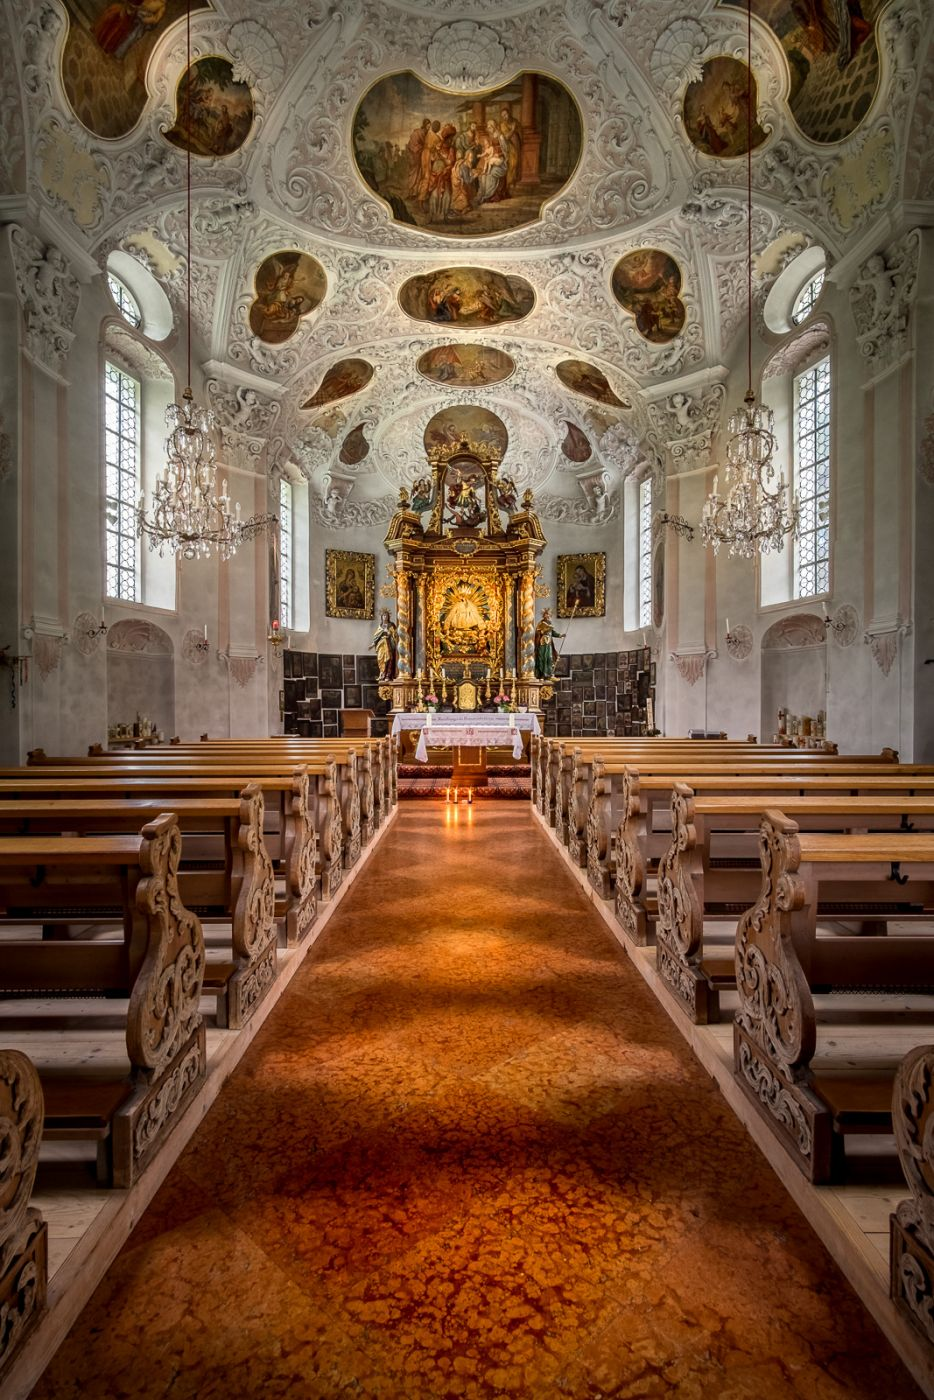 Pilgrimage Church of Maria Gern, Germany